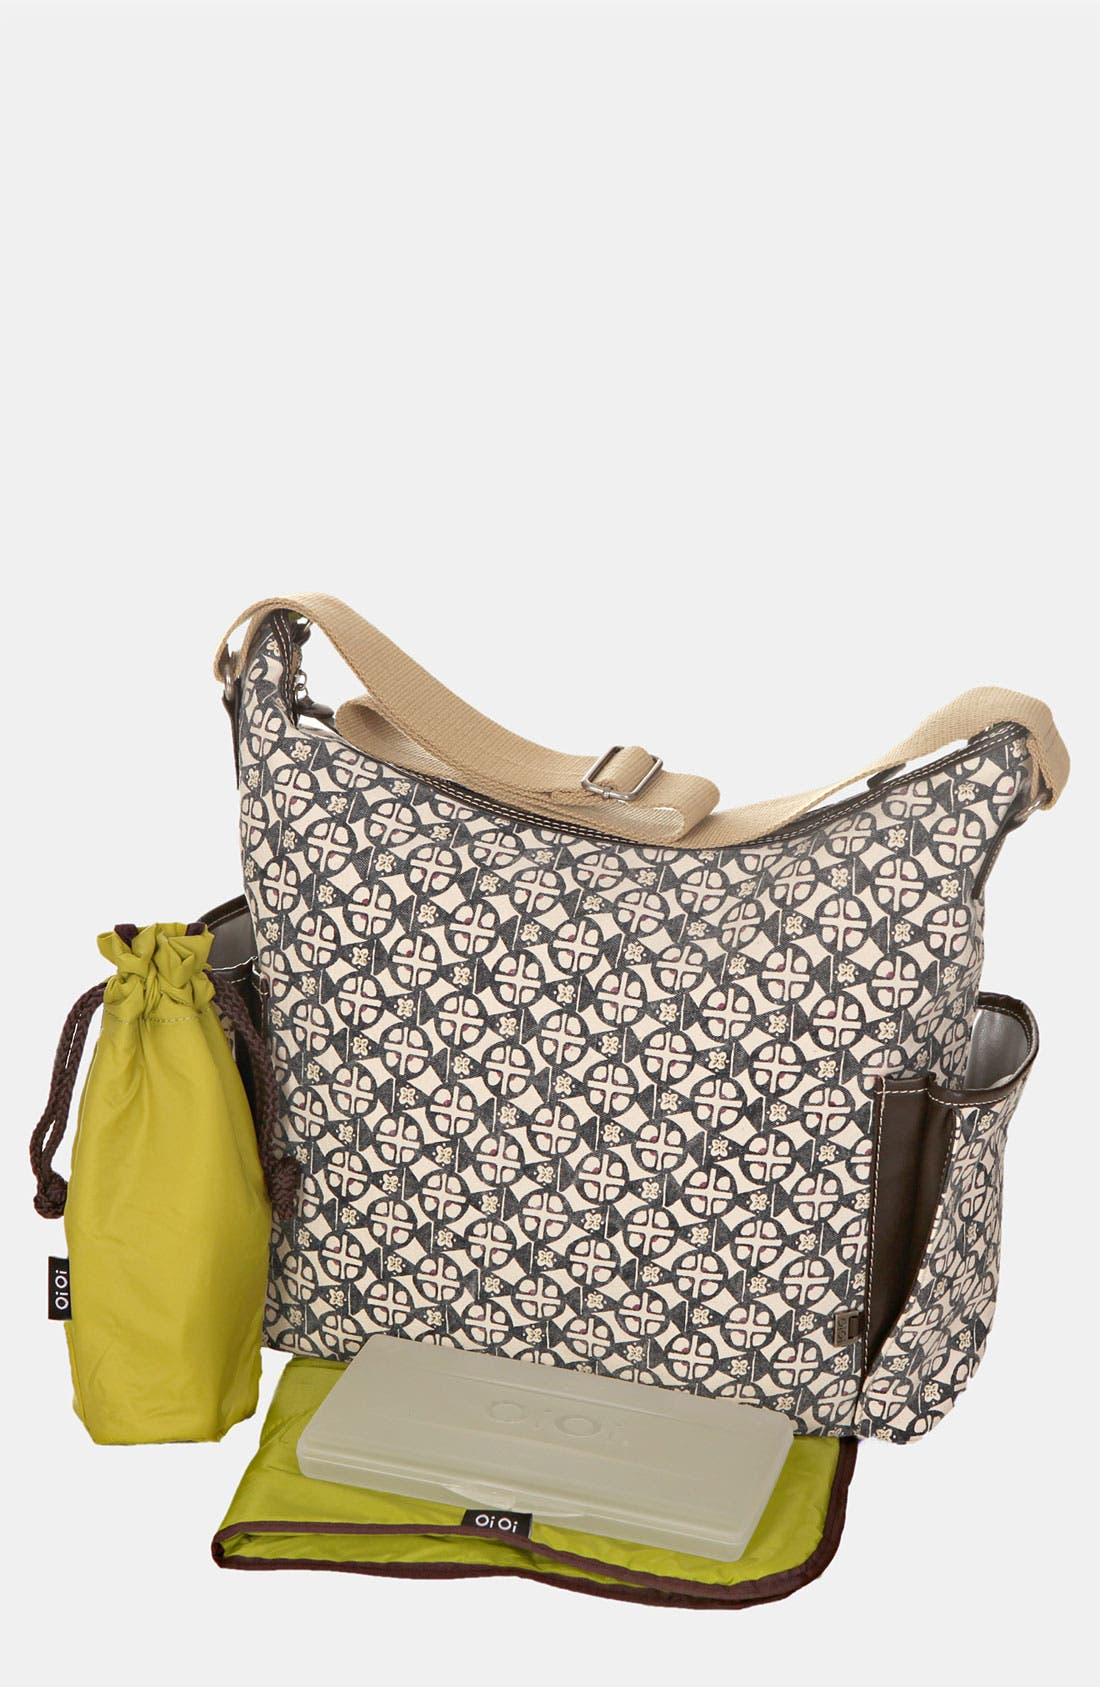 Main Image - OiOi 'Safari Medallion' Diaper Bag